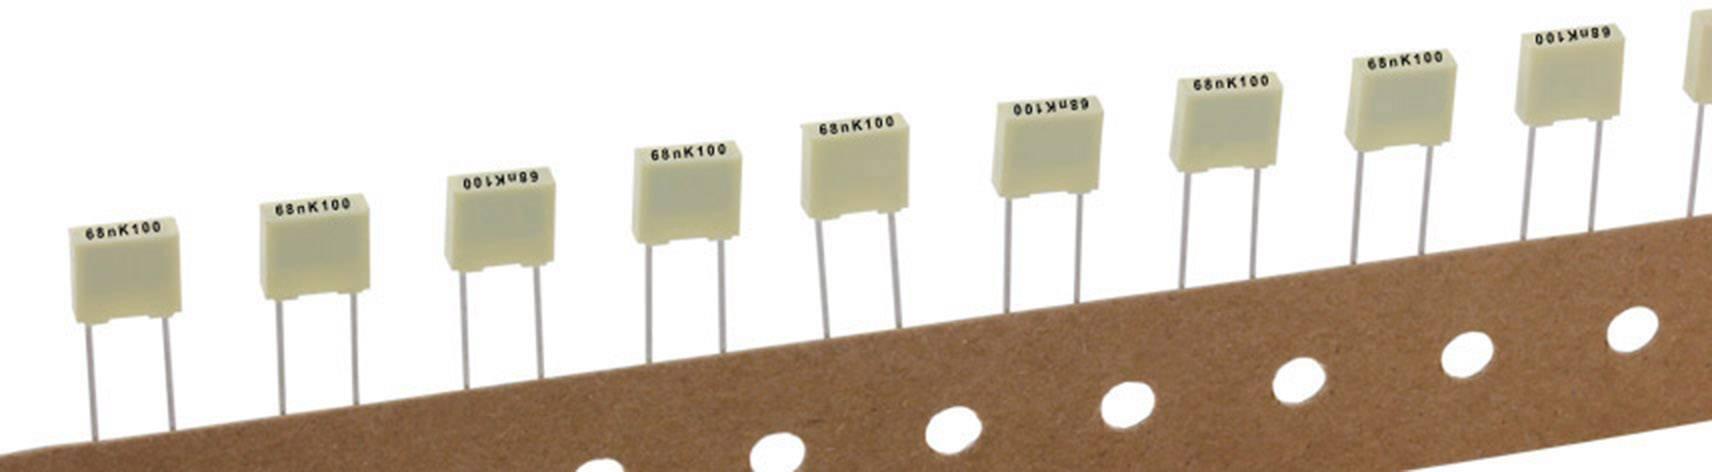 Polyesterový kondenzátor Kemet R82EC1680DQ50K+ radiálne vývody, 6.8 nF, 100 V,10 %, 5 mm, (d x š x v) 7.2 x 2.5 mm x 6.5 mm, 1 ks